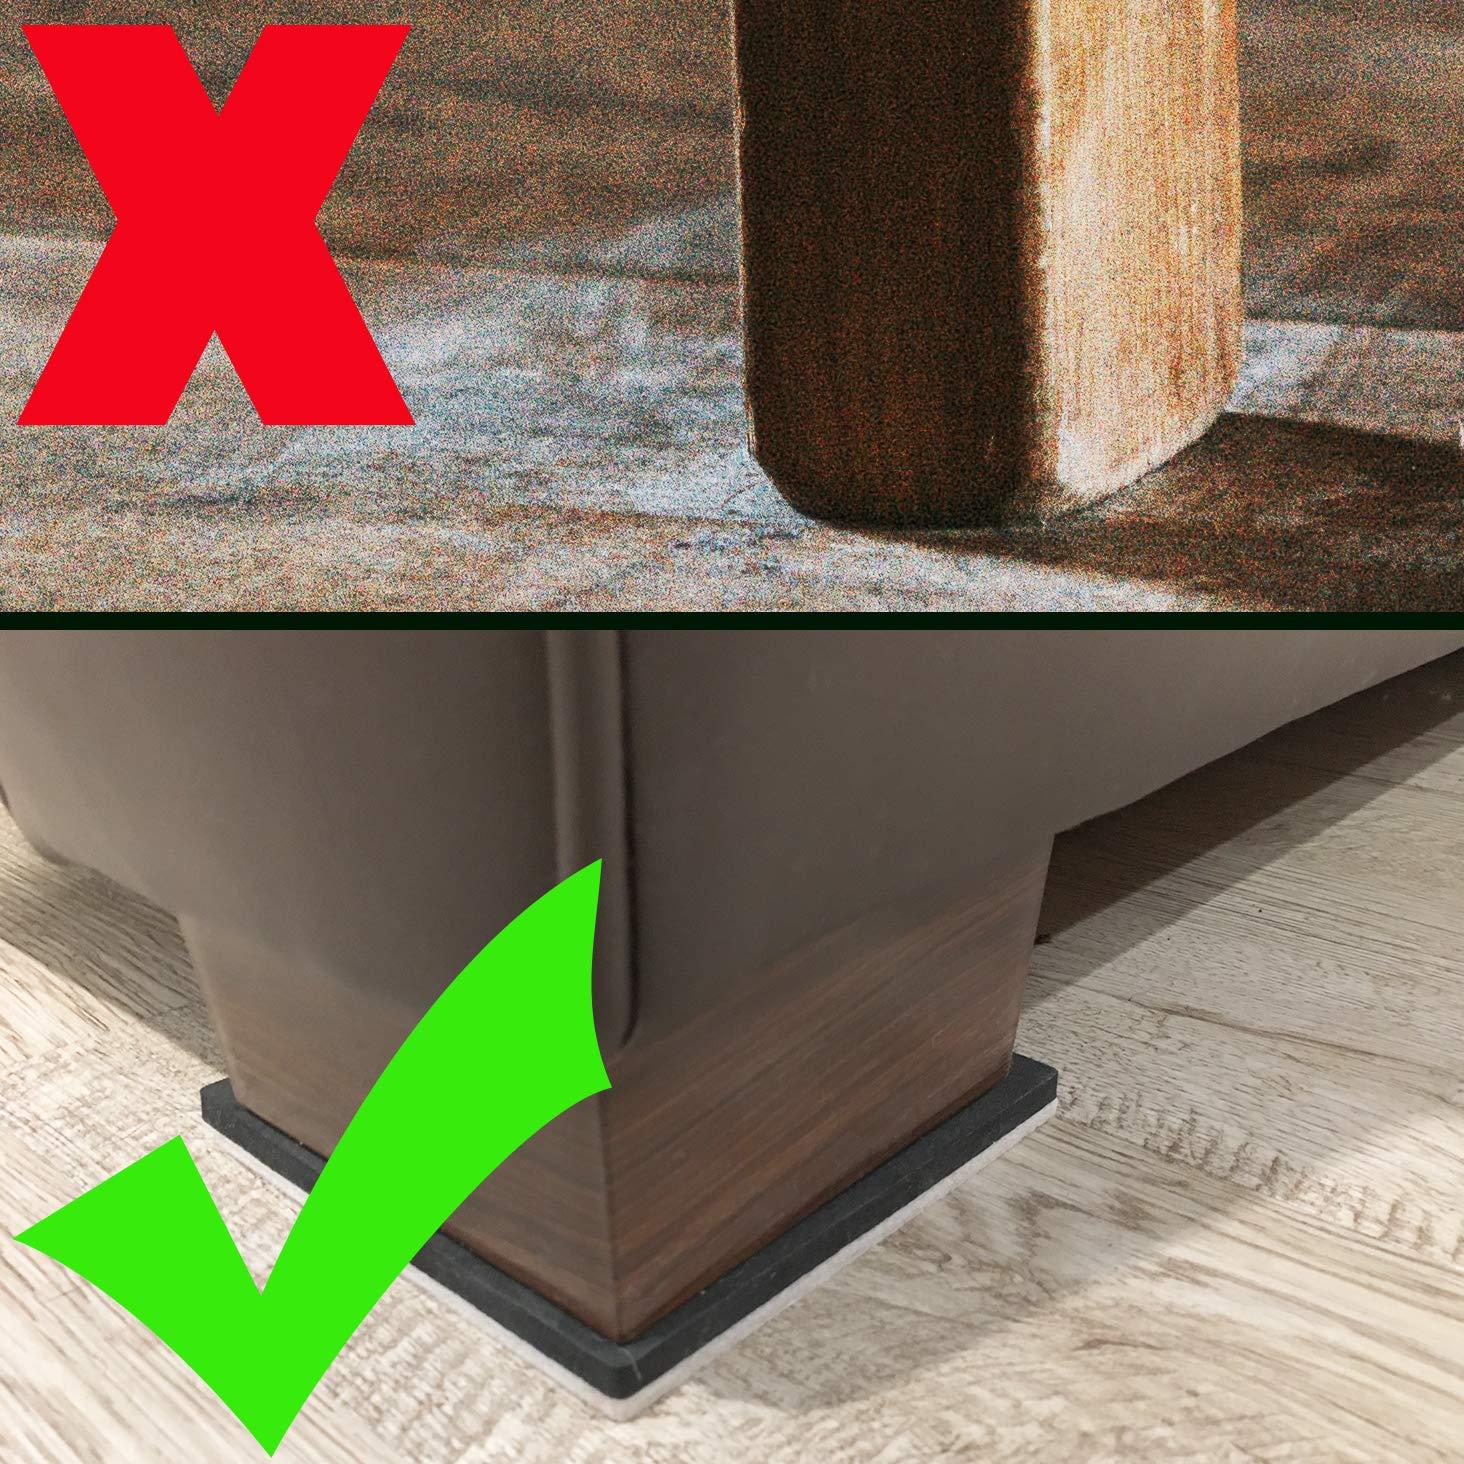 Liyic 20 Pack 3in.Square Felt Sliders for Hard Surfaces-Felt Furniture Sliders - Heavy Duty Sliders – Reusable Hardwood Floor Sliders -Furniture Moving Sliders-Sofa Sliders Gliders Glides Movers by Liyic (Image #5)